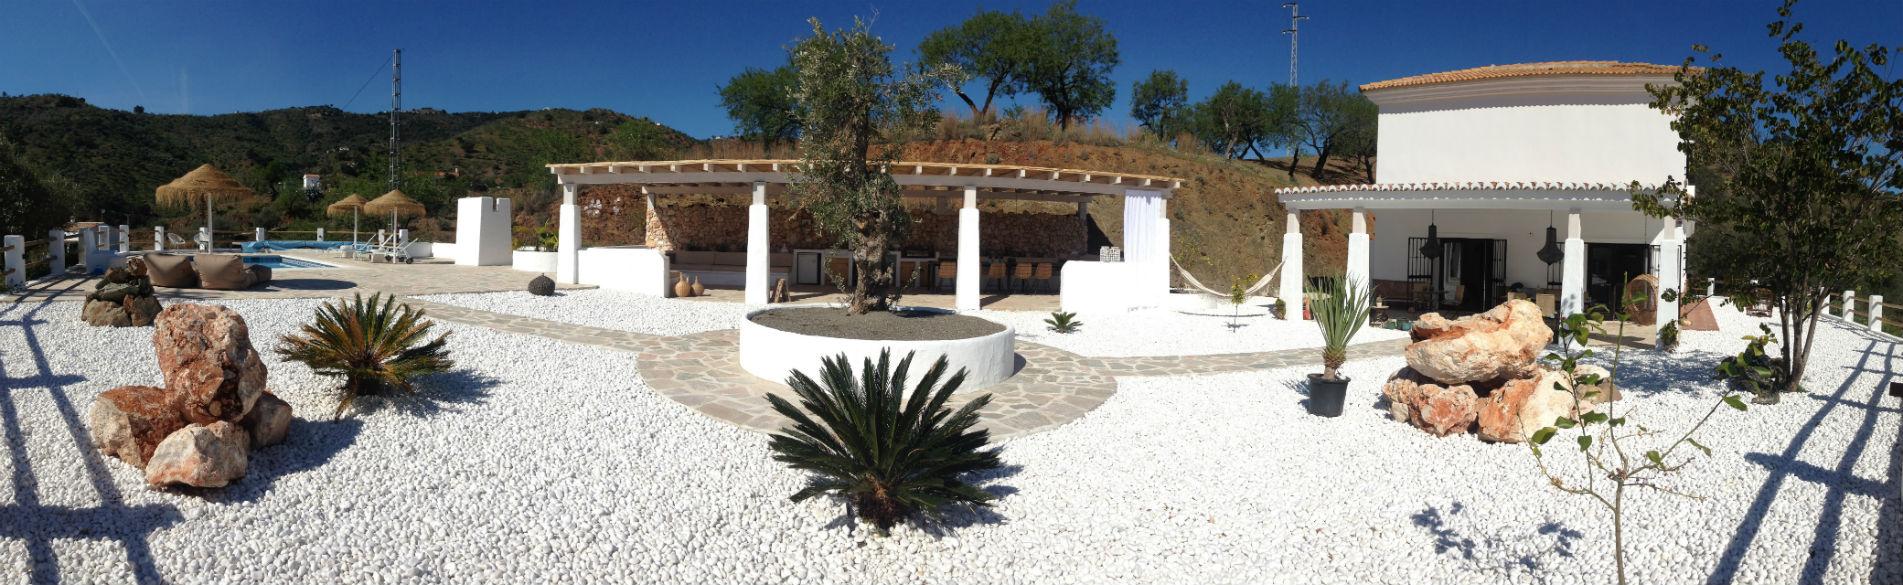 Villa Pepita Andalusie - Panorama